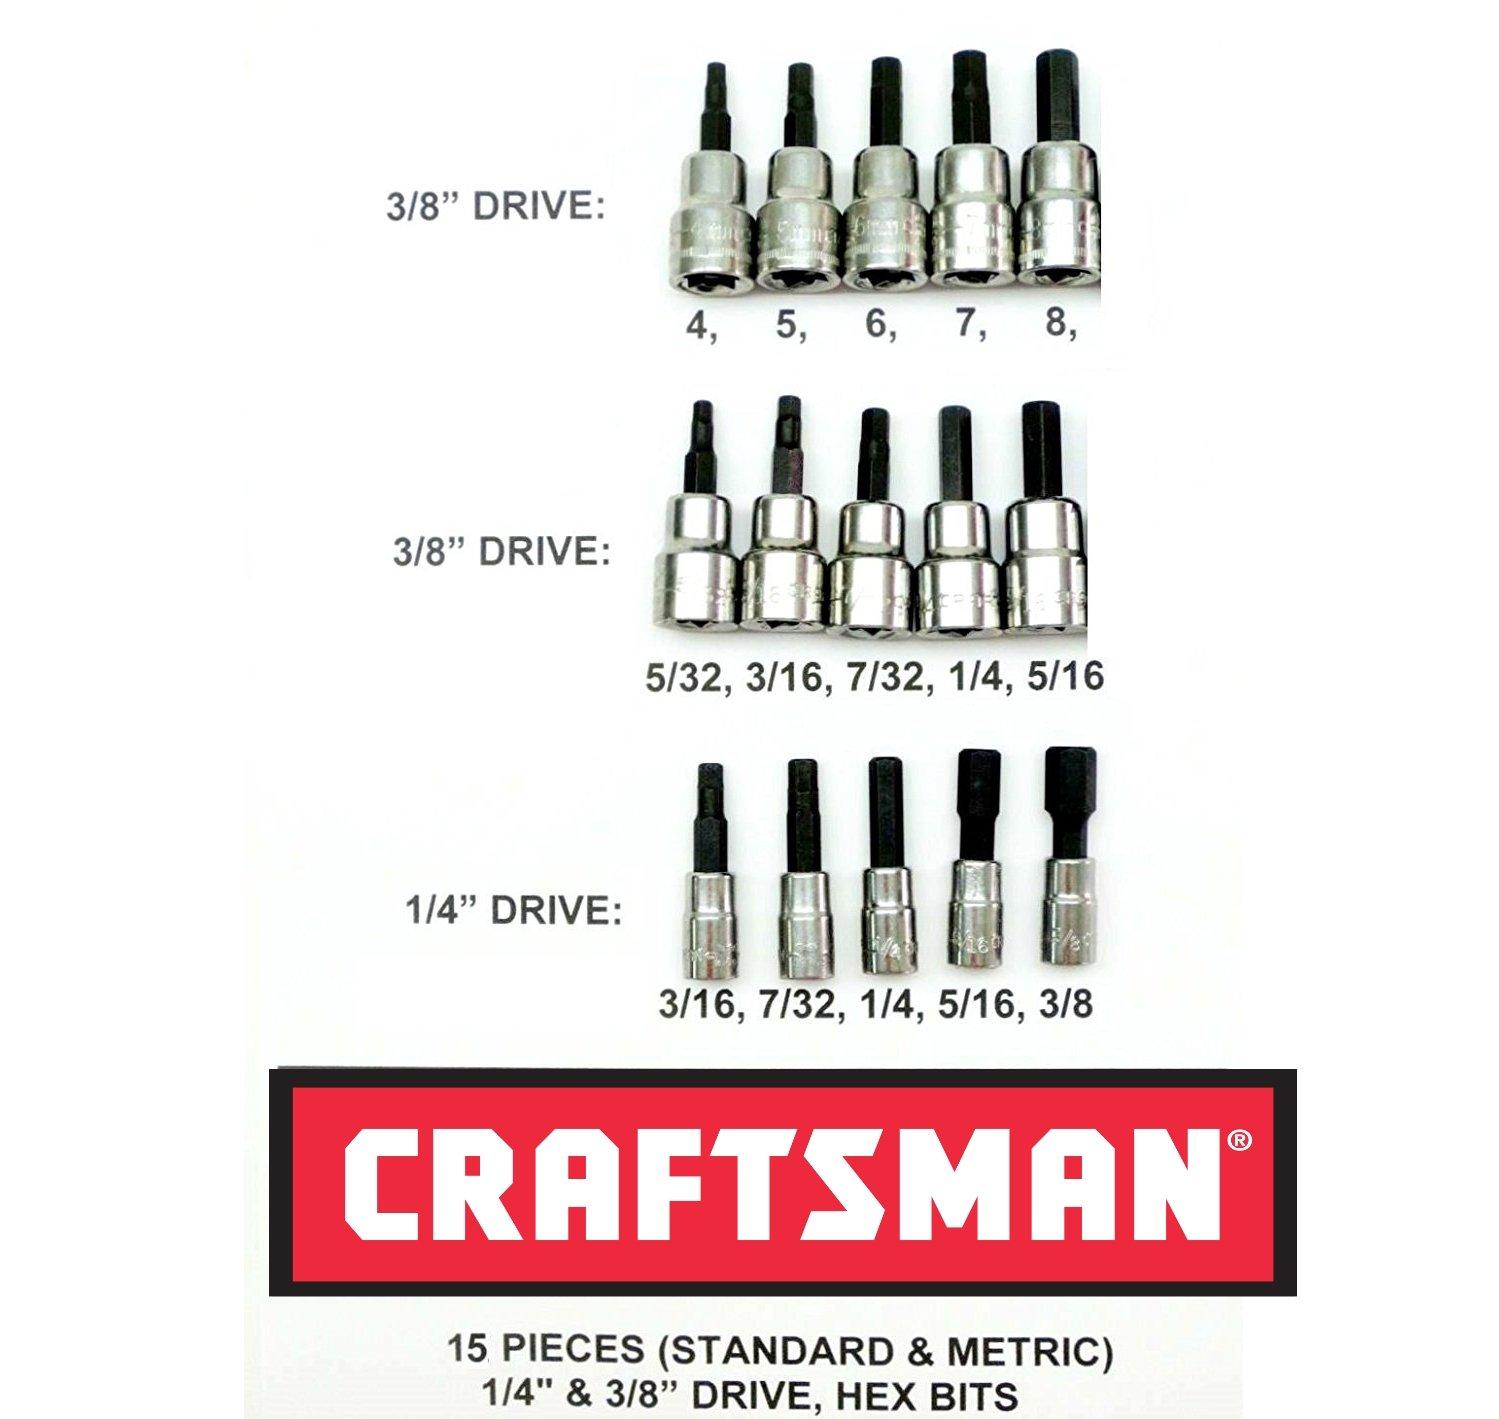 Craftsman 15 Piece 3/8'' & 1/4'' Drive Hex Bit Allen Socket Set